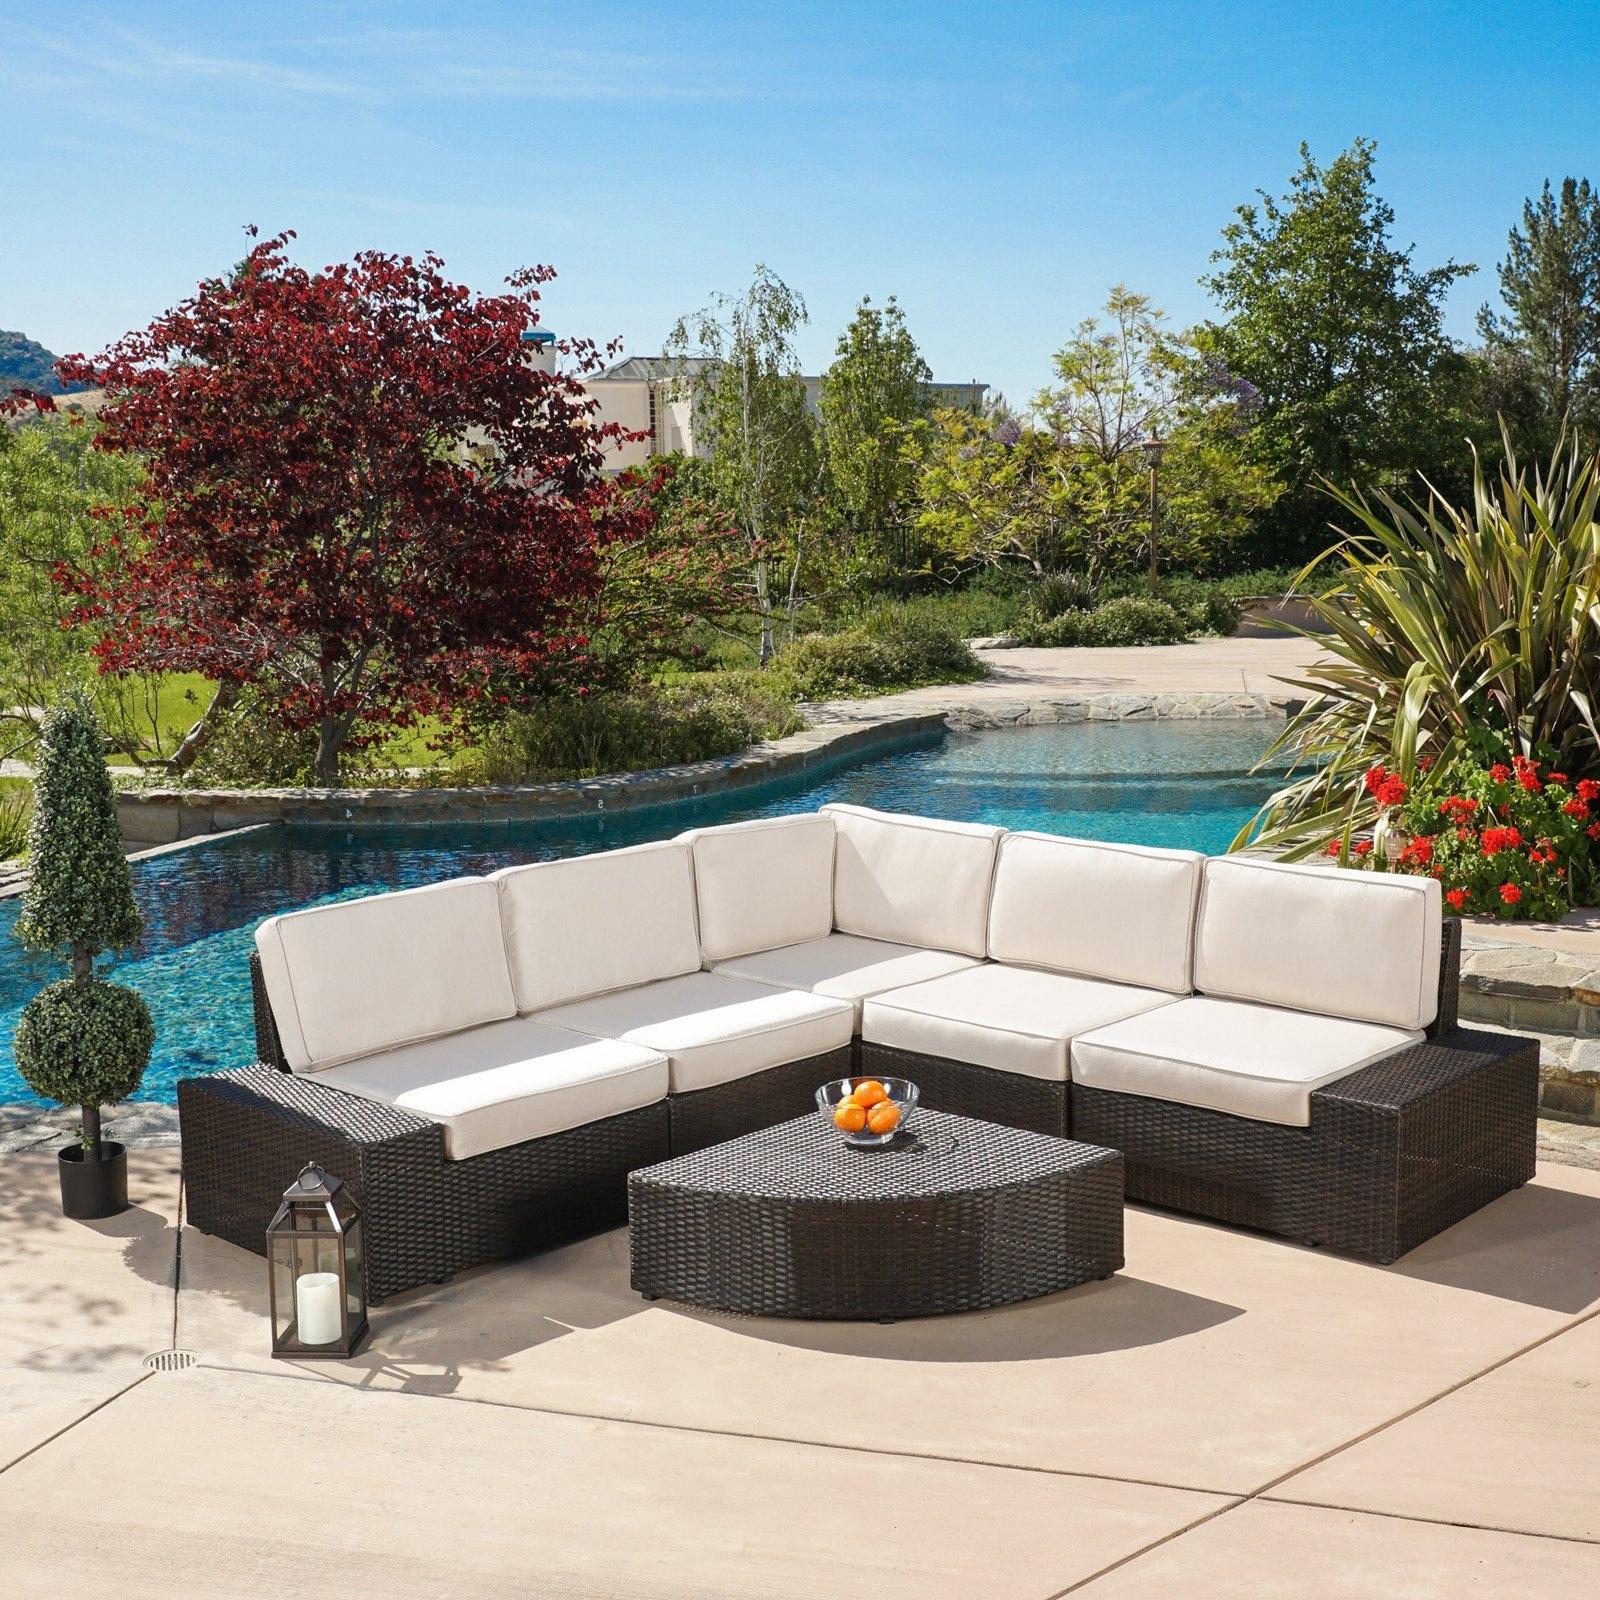 Zora Outdoor 6 Piece Sofa Conversation Set – Walmart Regarding Current Patio Conversation Sets With Sunbrella Cushions (Gallery 15 of 20)